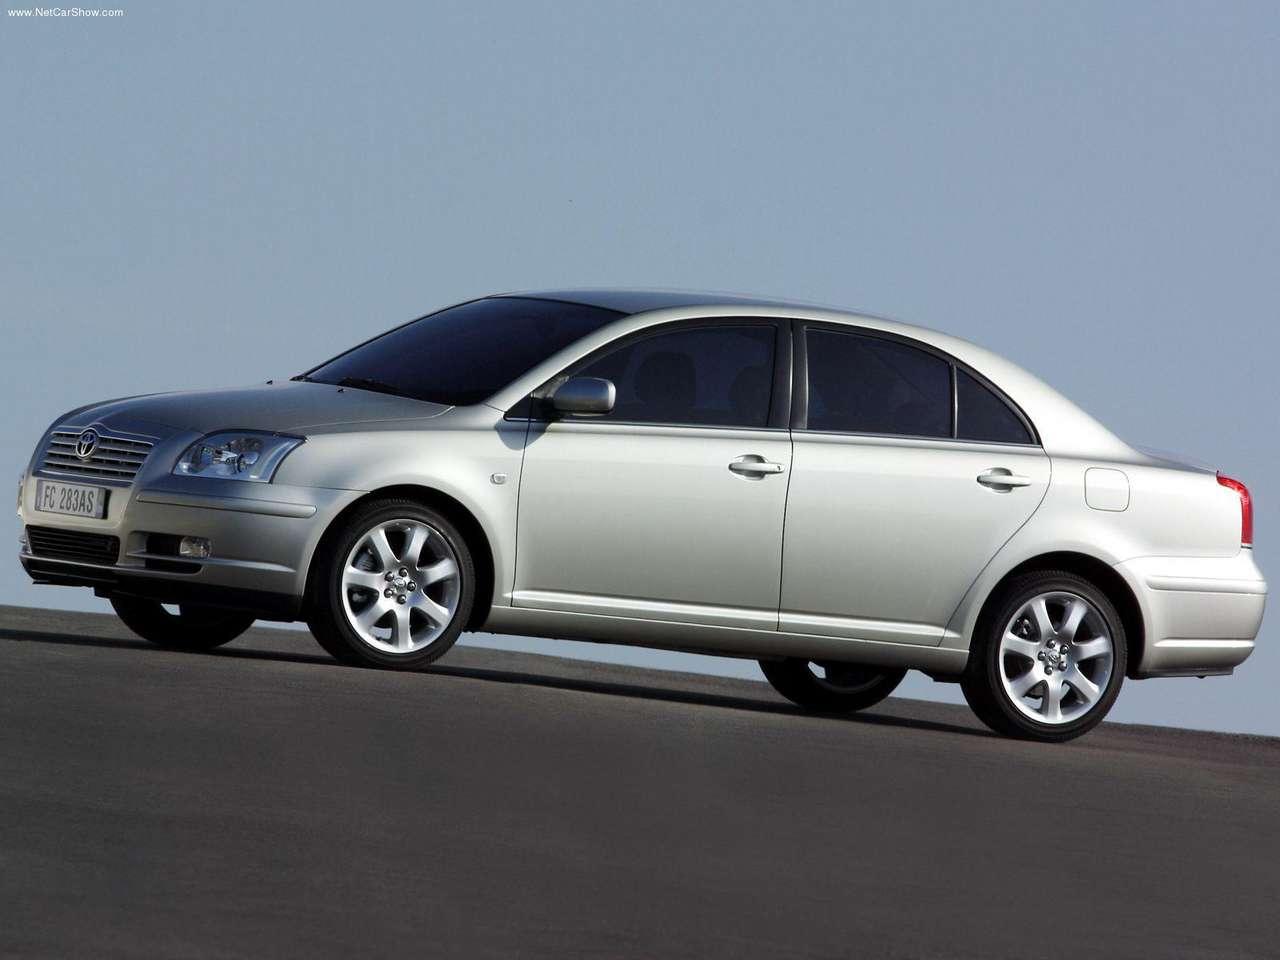 2003 toyota avensis sedan toyota autos spain. Black Bedroom Furniture Sets. Home Design Ideas